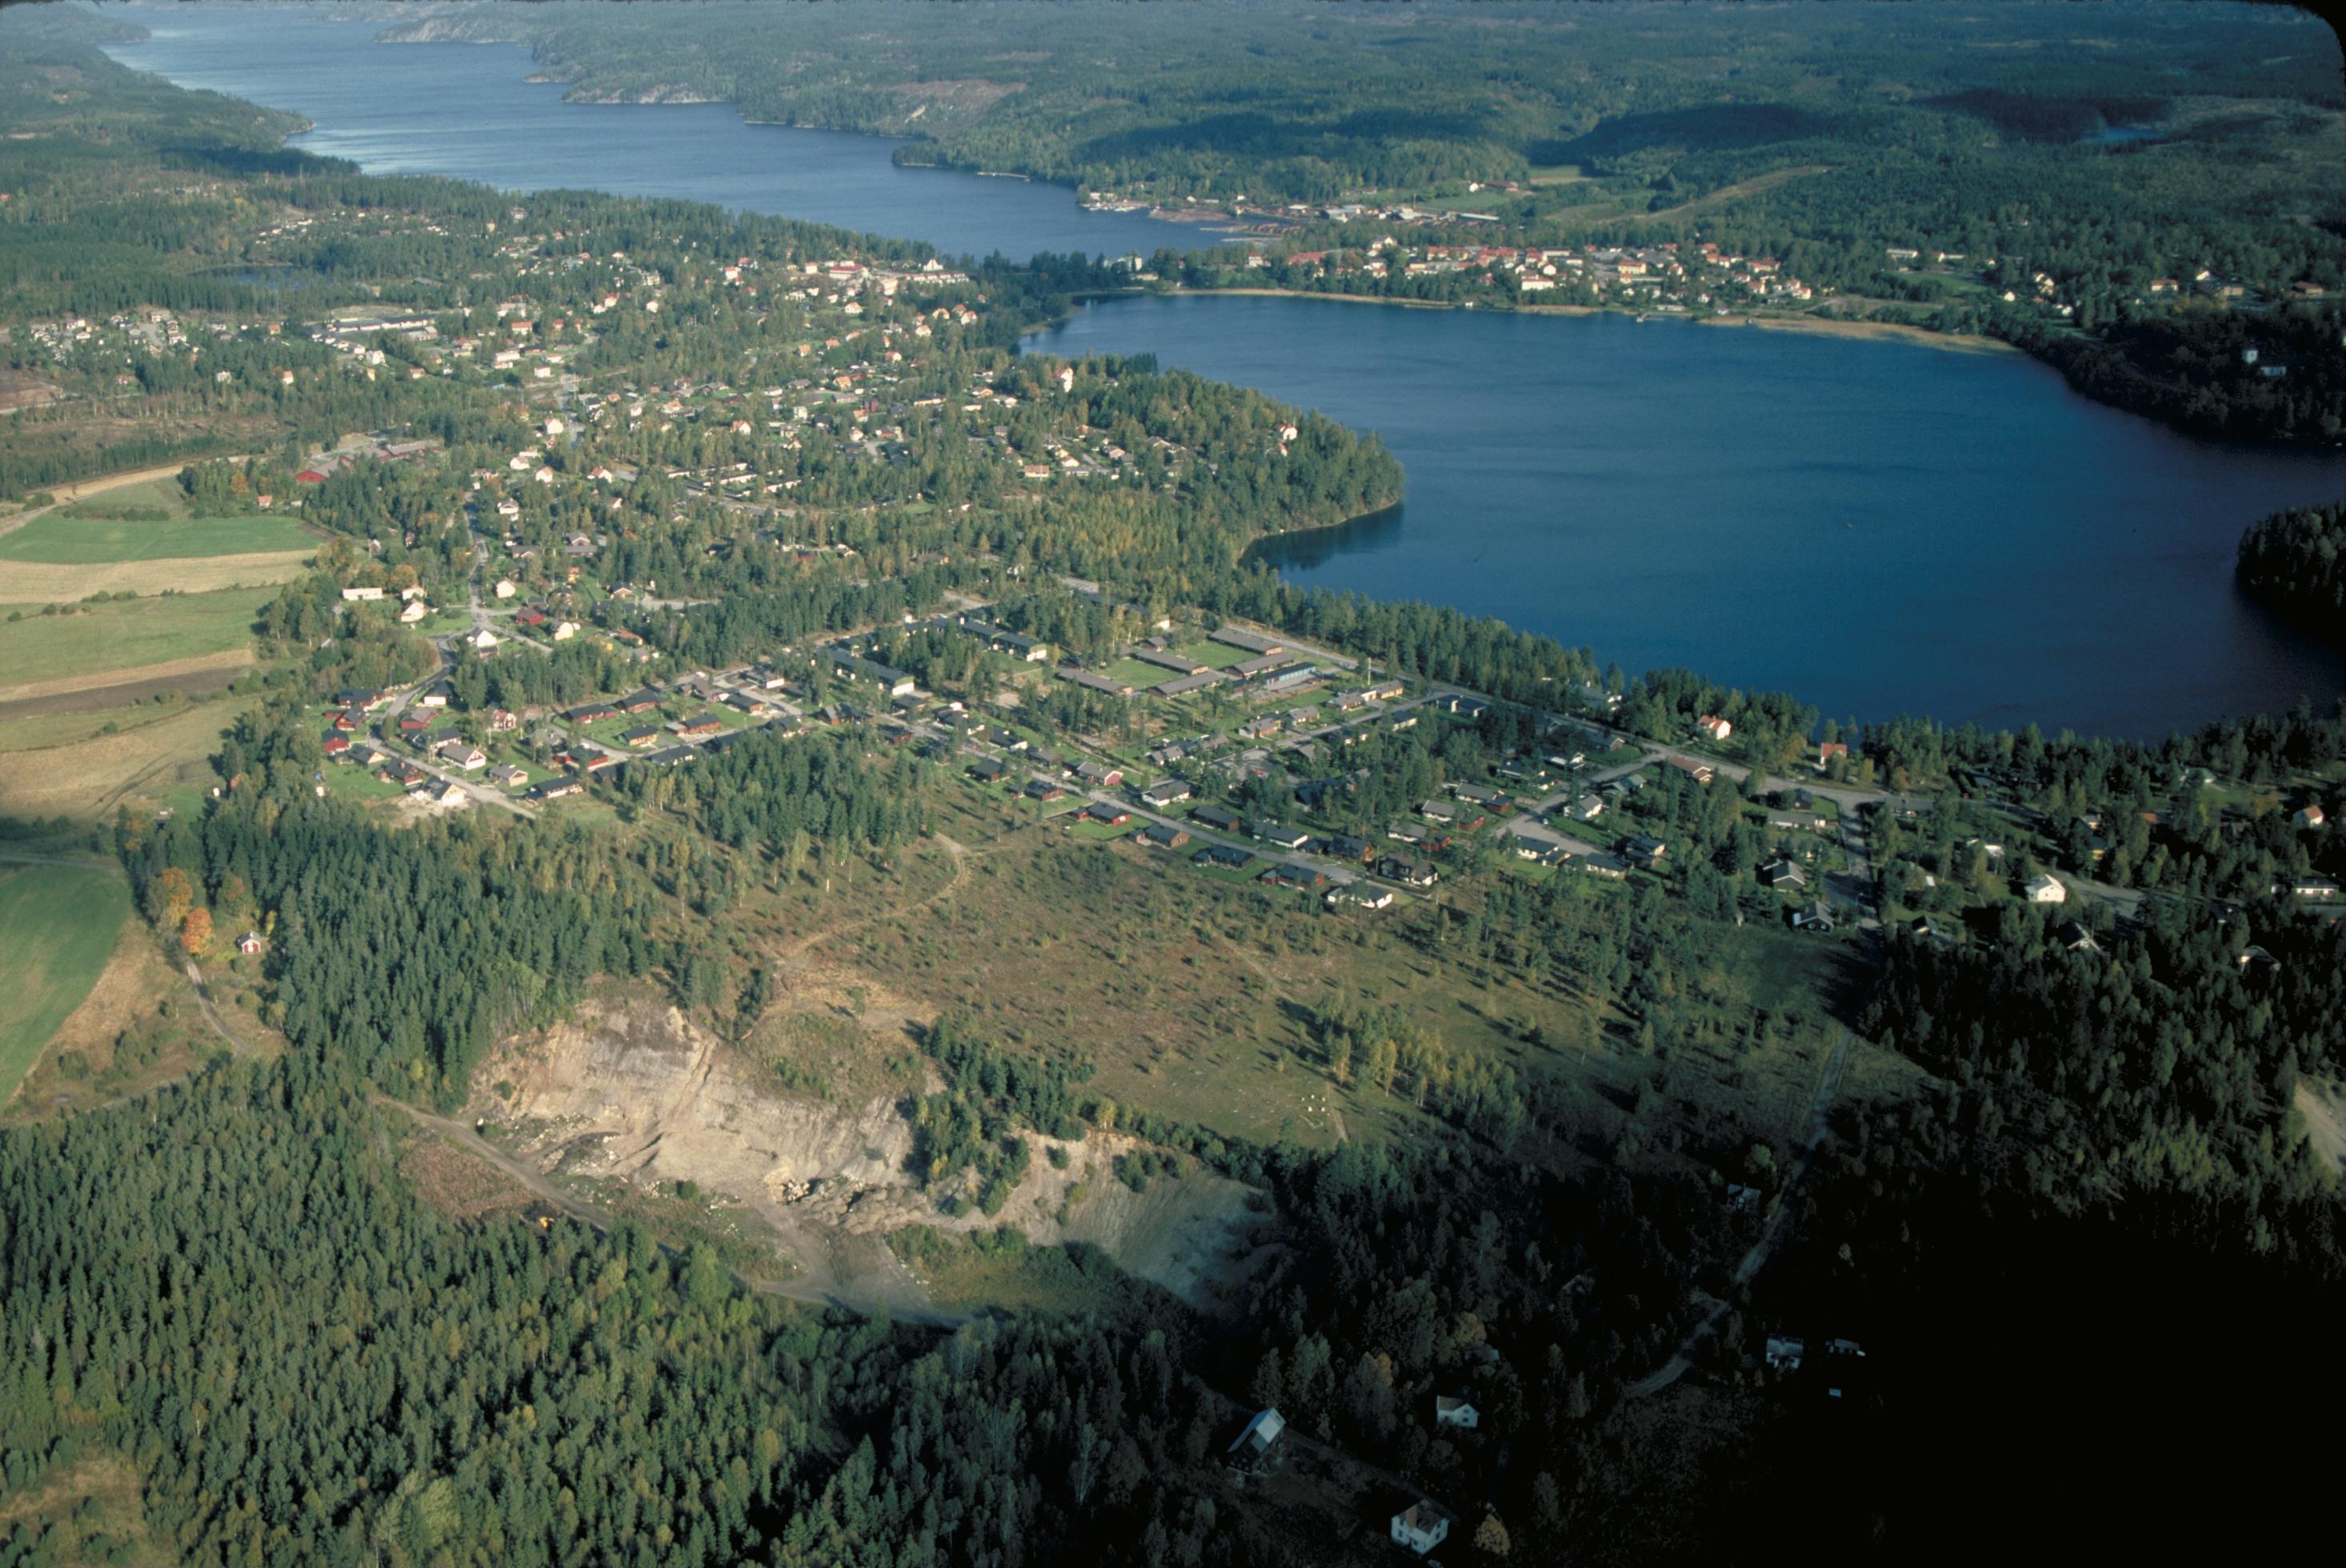 ed sverige kart Dals Ed kommune – Wikipedia